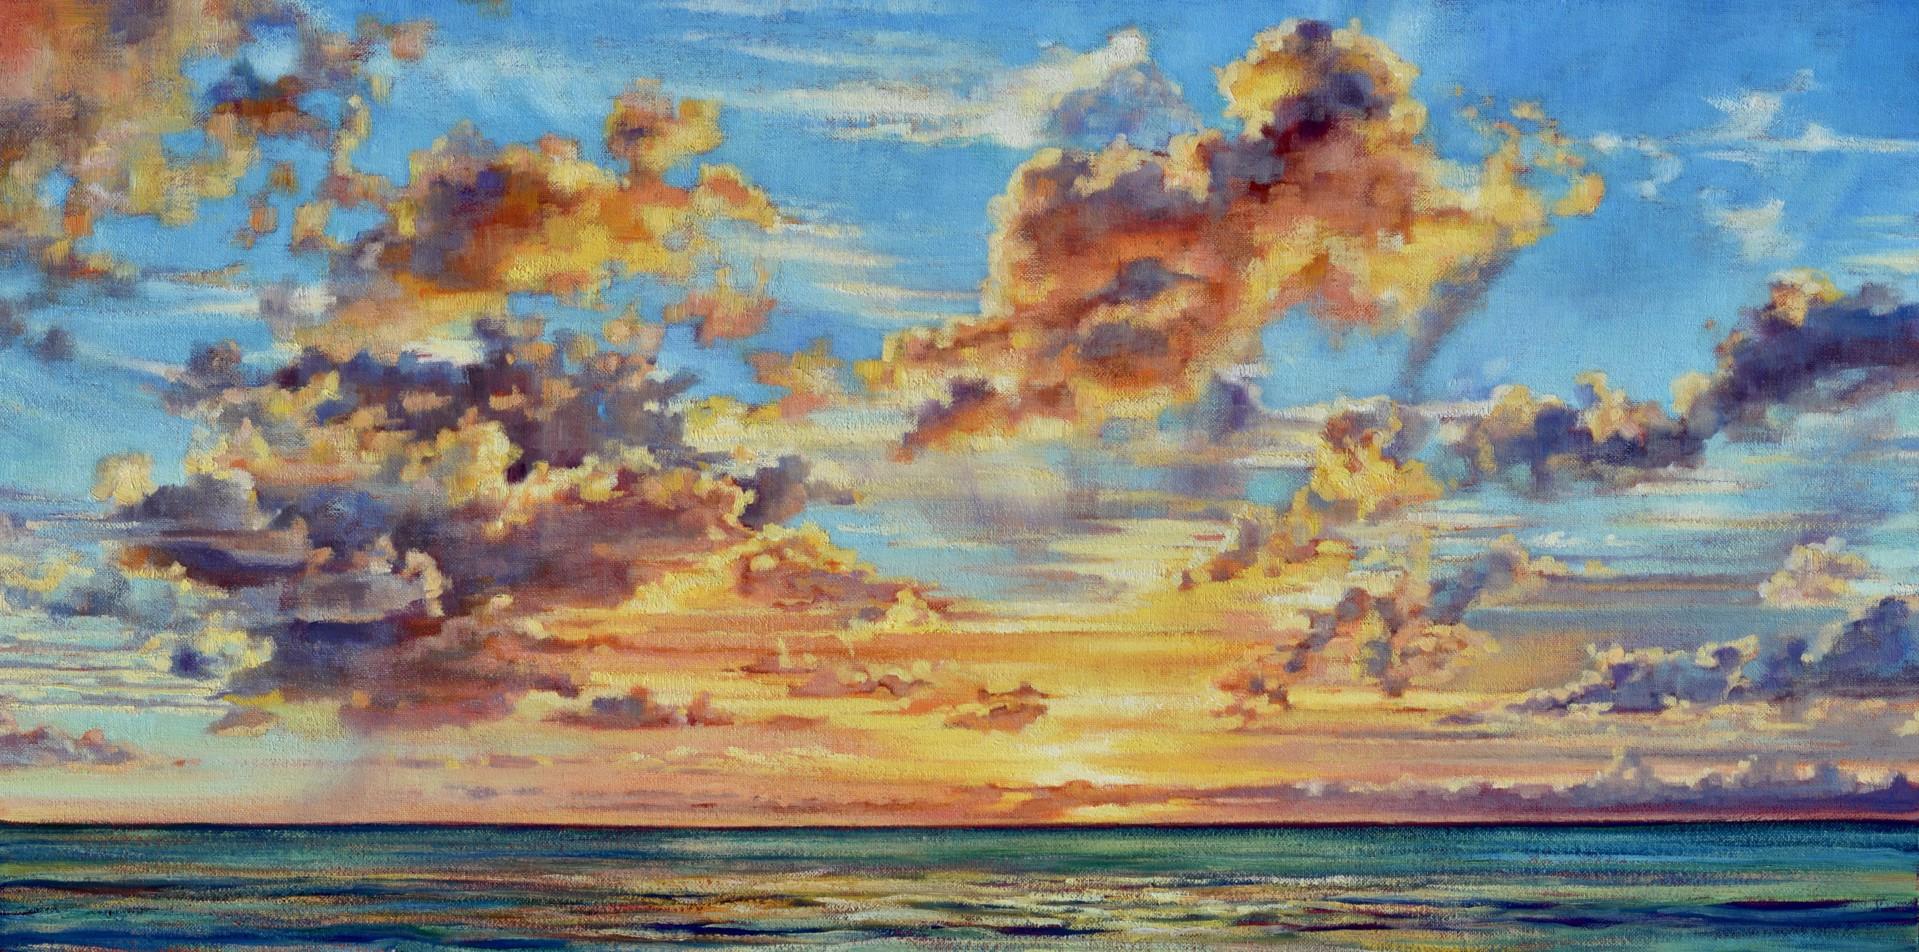 Solstice Sunset by Caroline Zimmermann